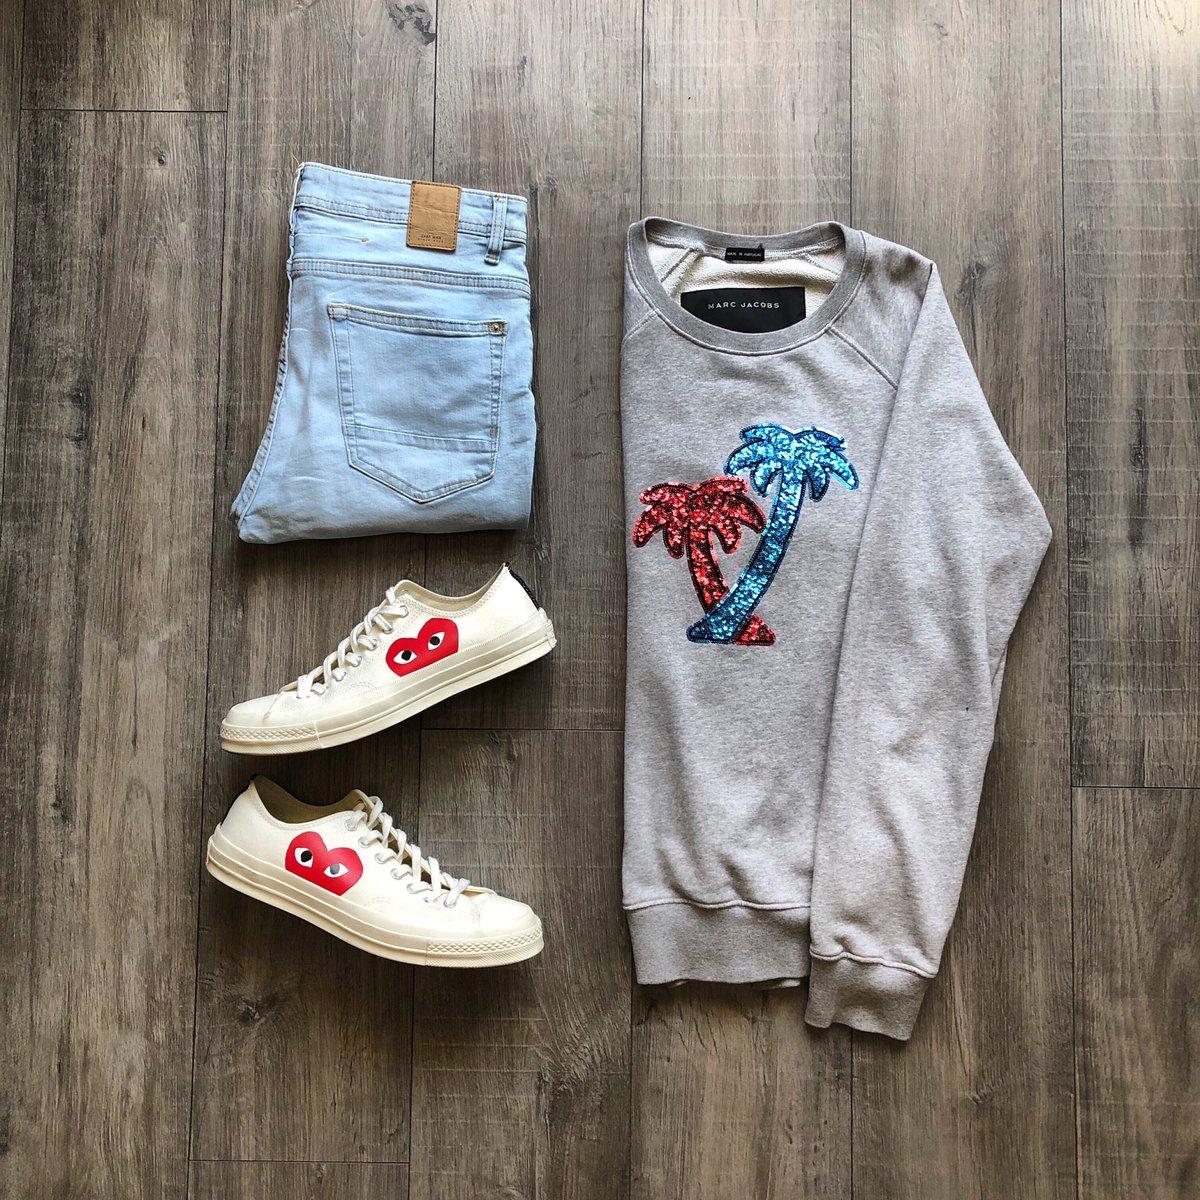 BrandsSweater #marcjacobs Pants #zara Shoes #commedesgarcons • • • #mensfashion #mensstyle #menwithstyle #menswear #streetstyleguys #guyfashion #styleforguys #malestreetwear #mensfashionteam #mensfashionairy #menaboutfashion #OOTDMenStyle #menfashionapparelpic.twitter.com/JmhyRfPCvW